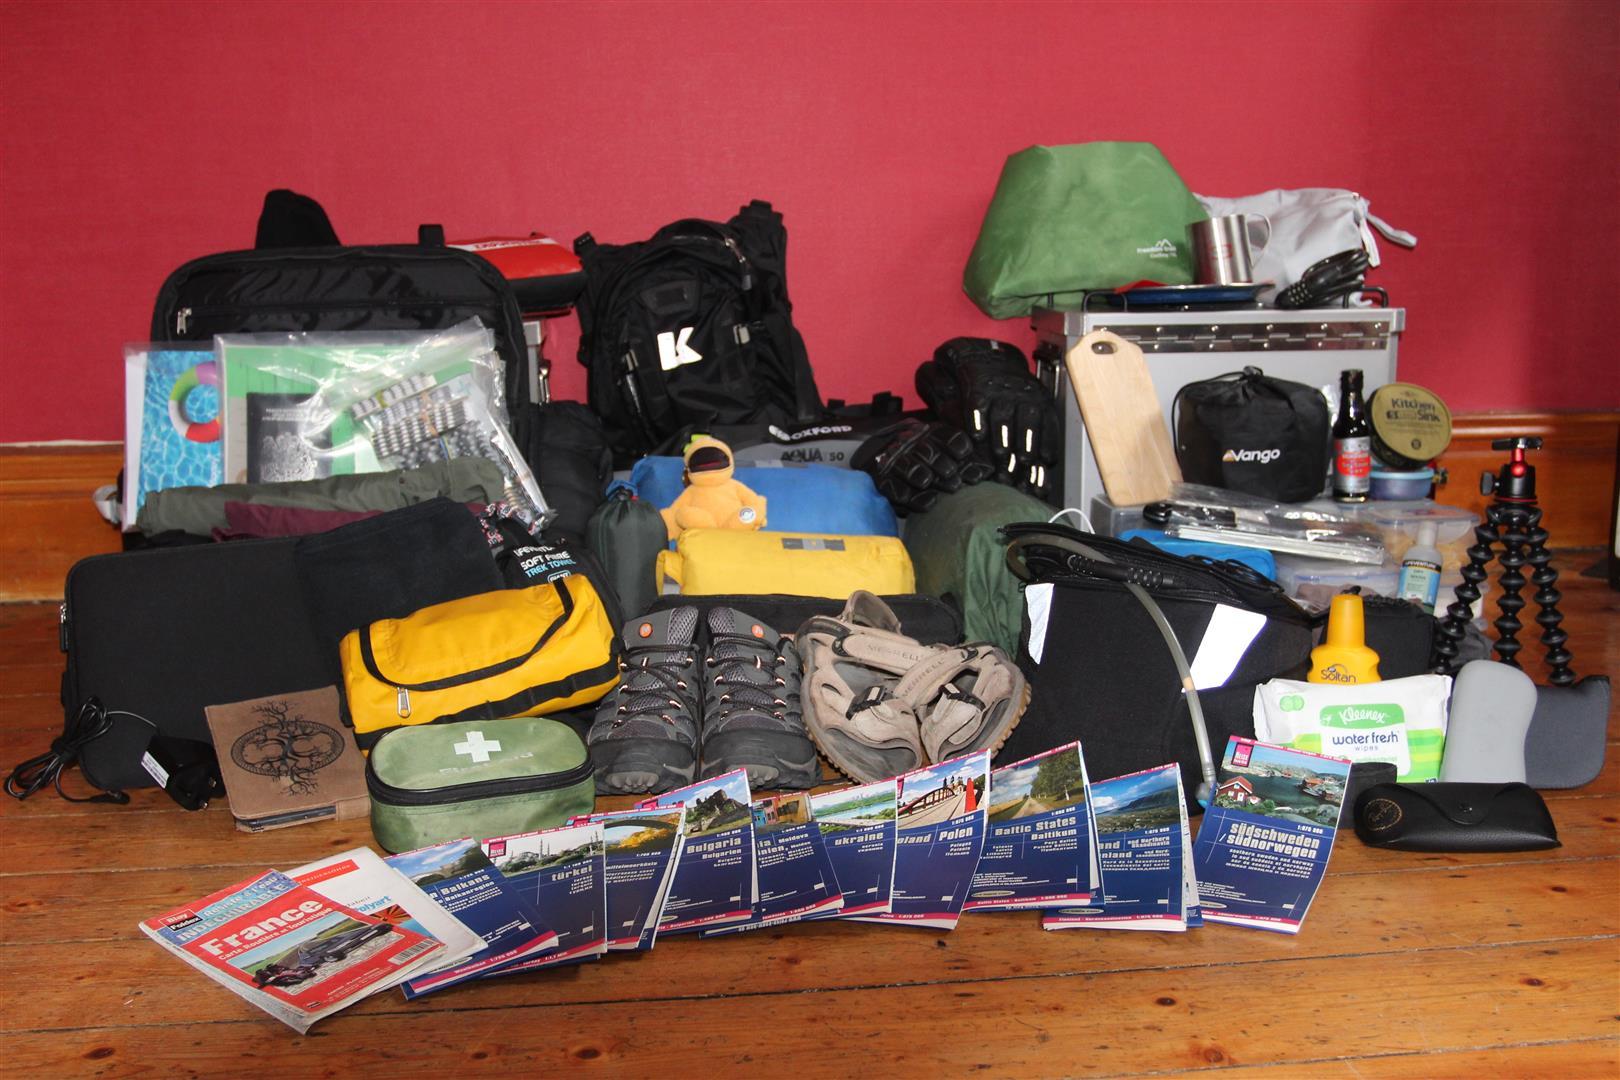 Lots of stuff to take